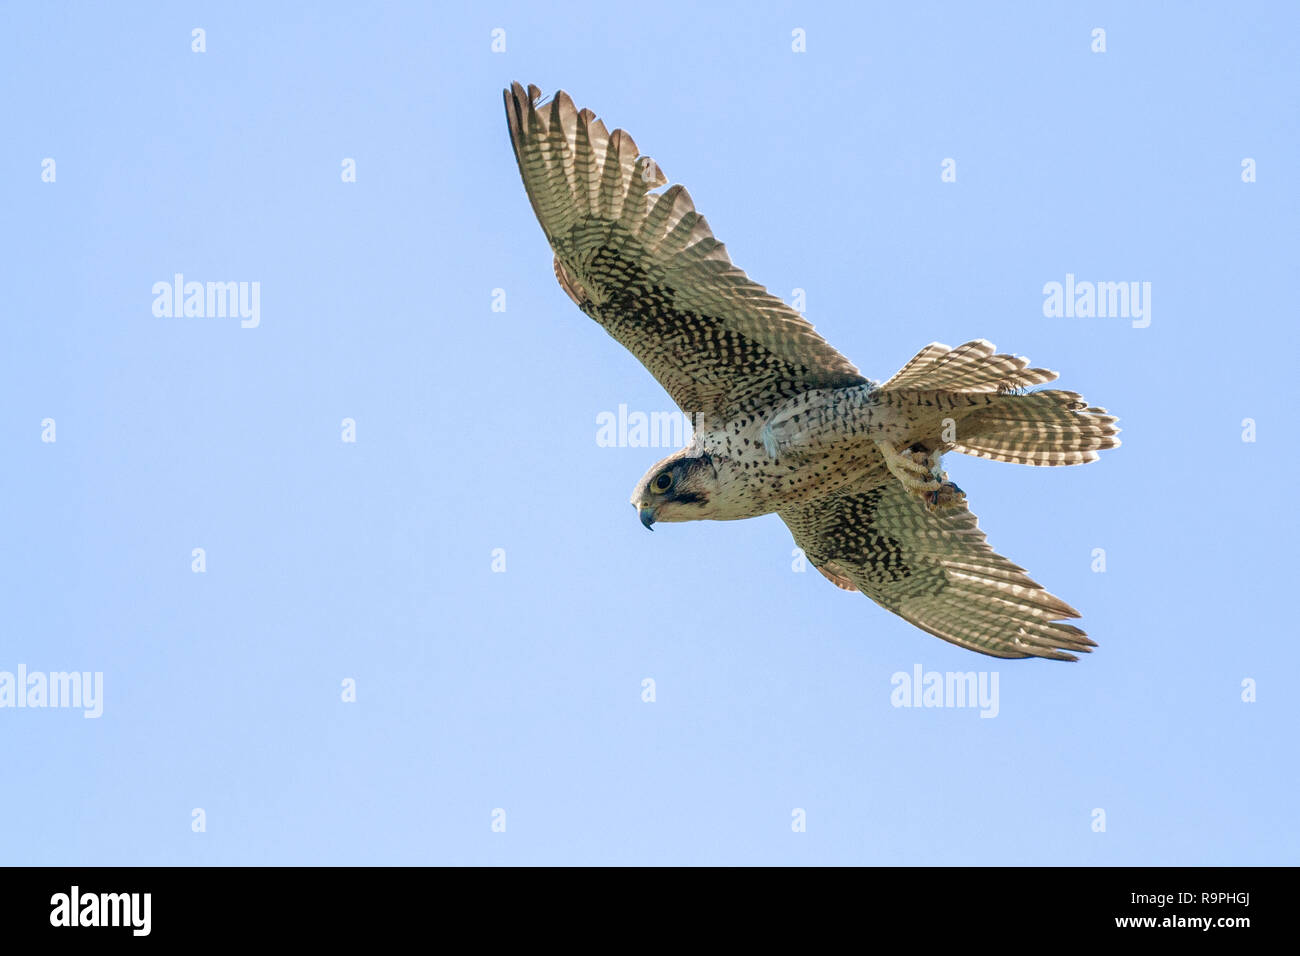 Lannerfalke (Falco biarmicus feldeggi), Erwachsene im Flug Stockbild